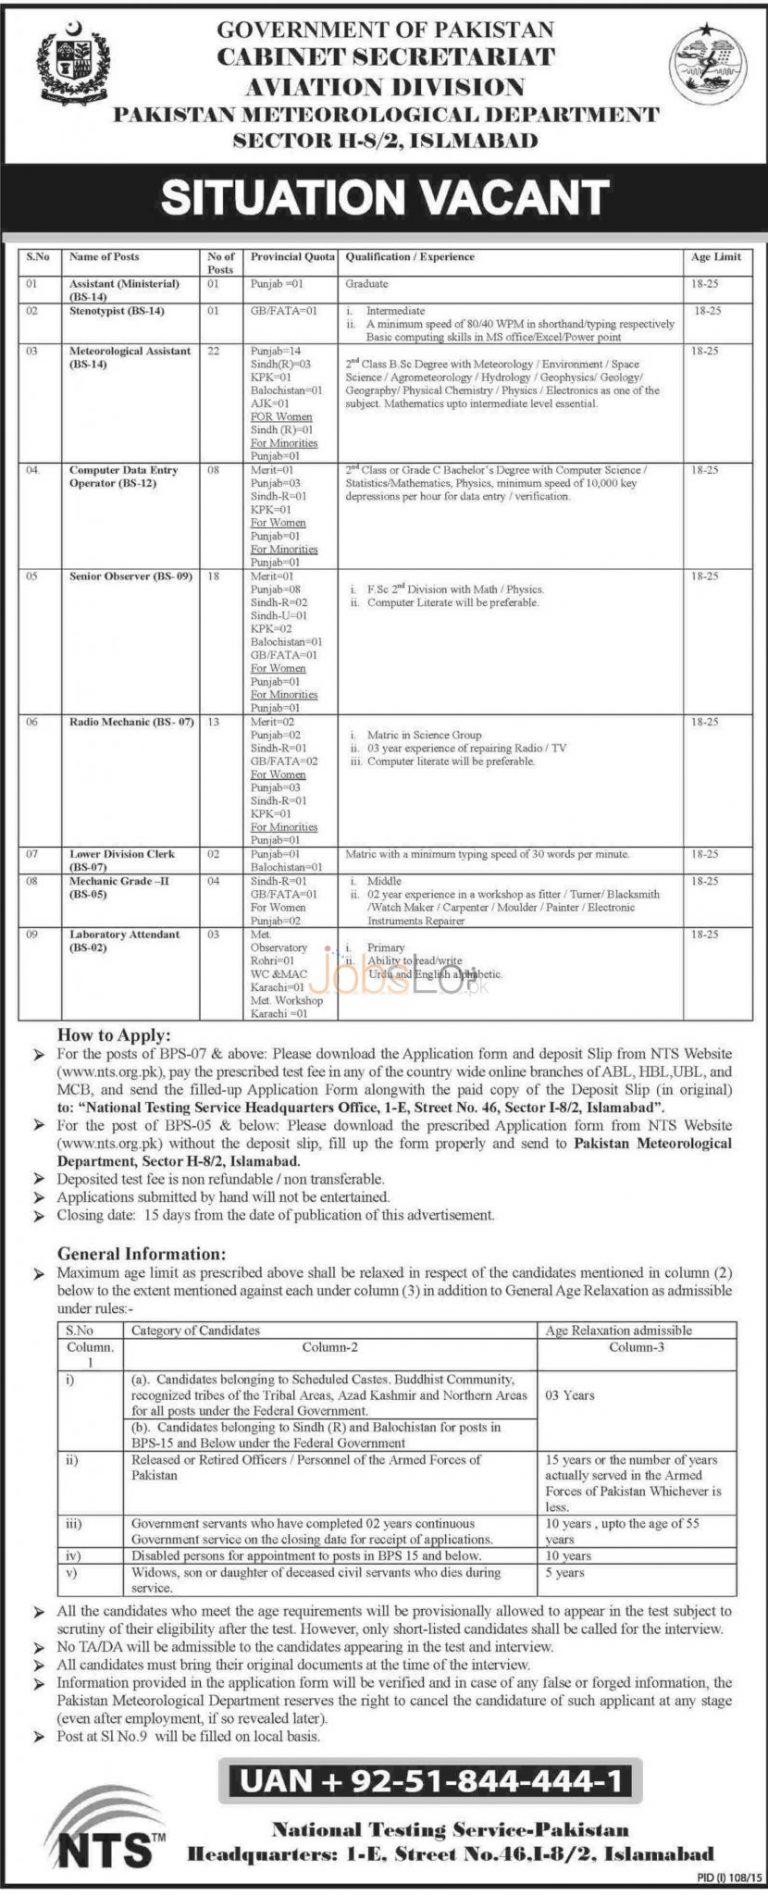 Cabinet Secretariat Aviation Division Islamabad NTS Jobs July 2015 Pakistan